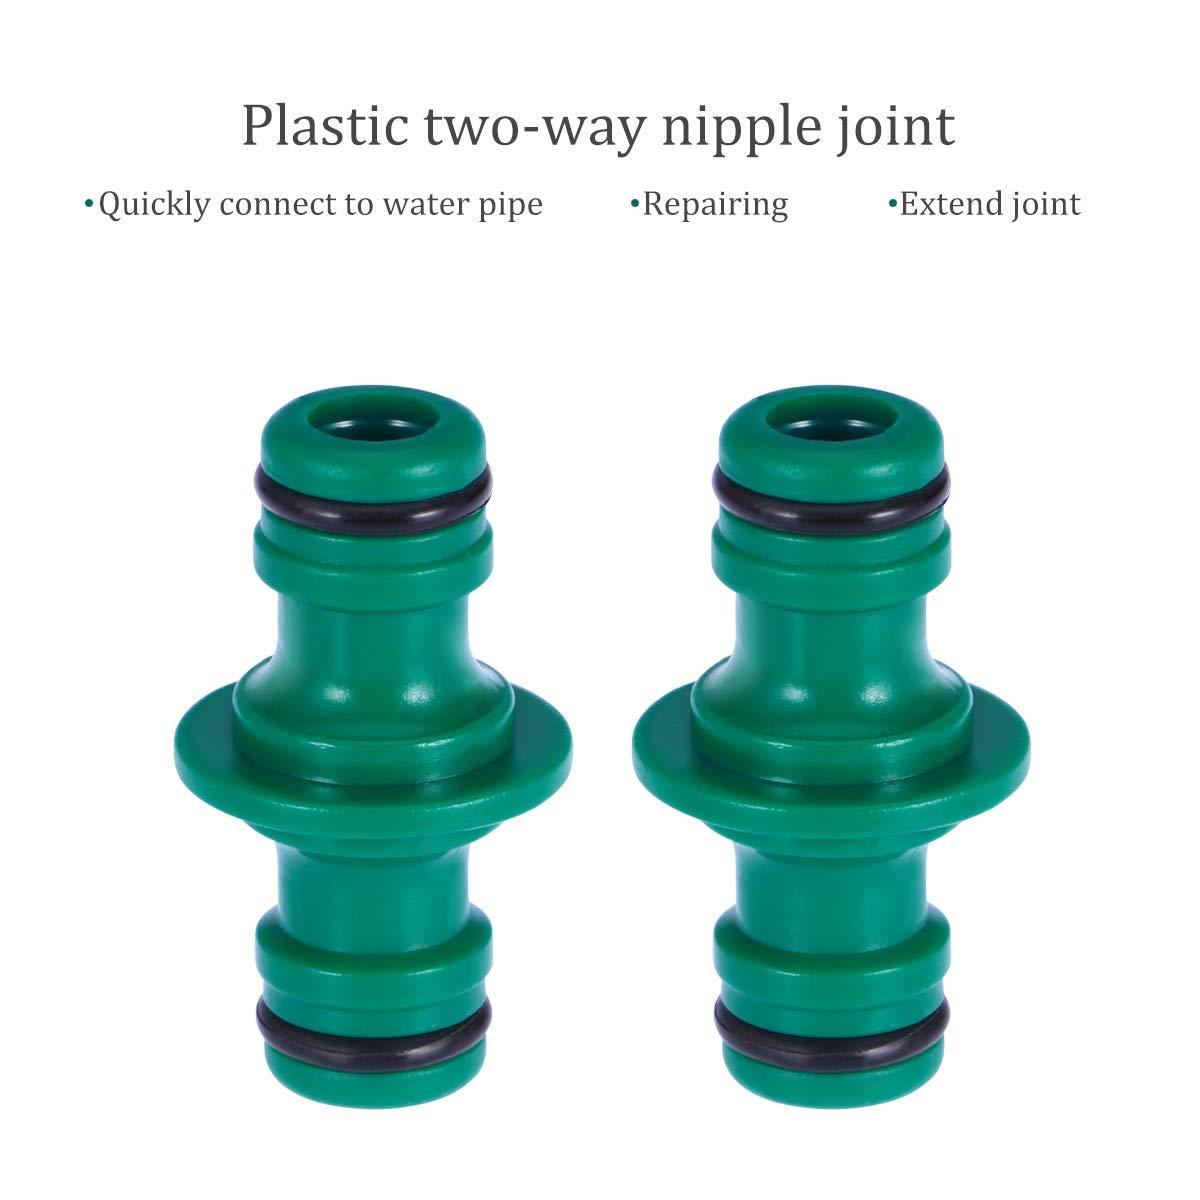 BESTONZON Adaptador de empalmes de dos vías de 2 piezas Adaptador de acoplamiento plástico de 1/2 pulgadas para Garden House: Amazon.es: Hogar